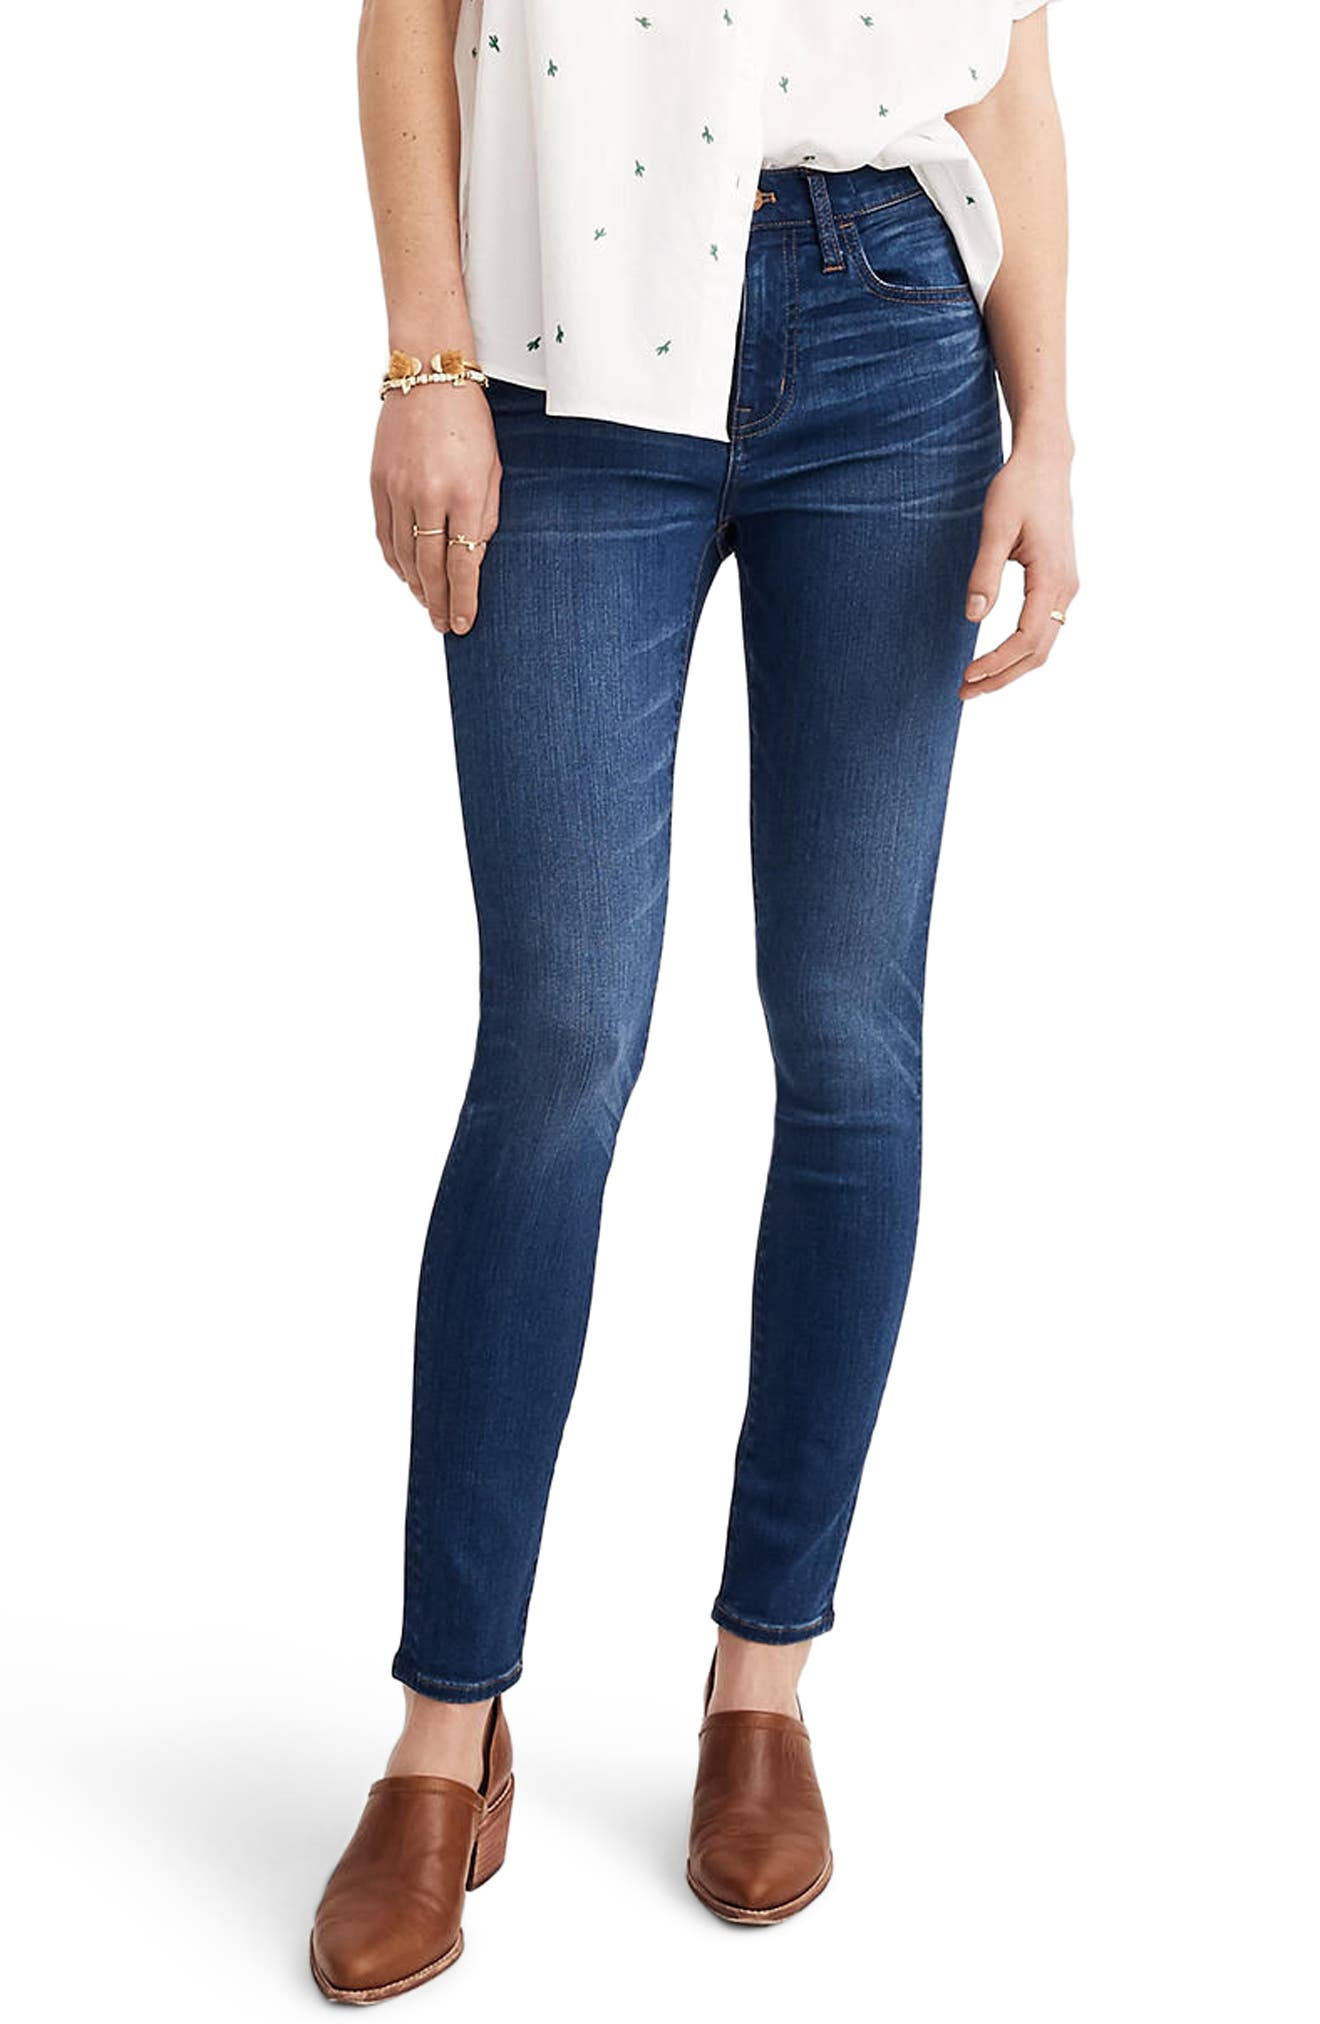 Roadtripper High Waist Skinny Jeans,                             Main thumbnail 1, color,                             Orson Wash